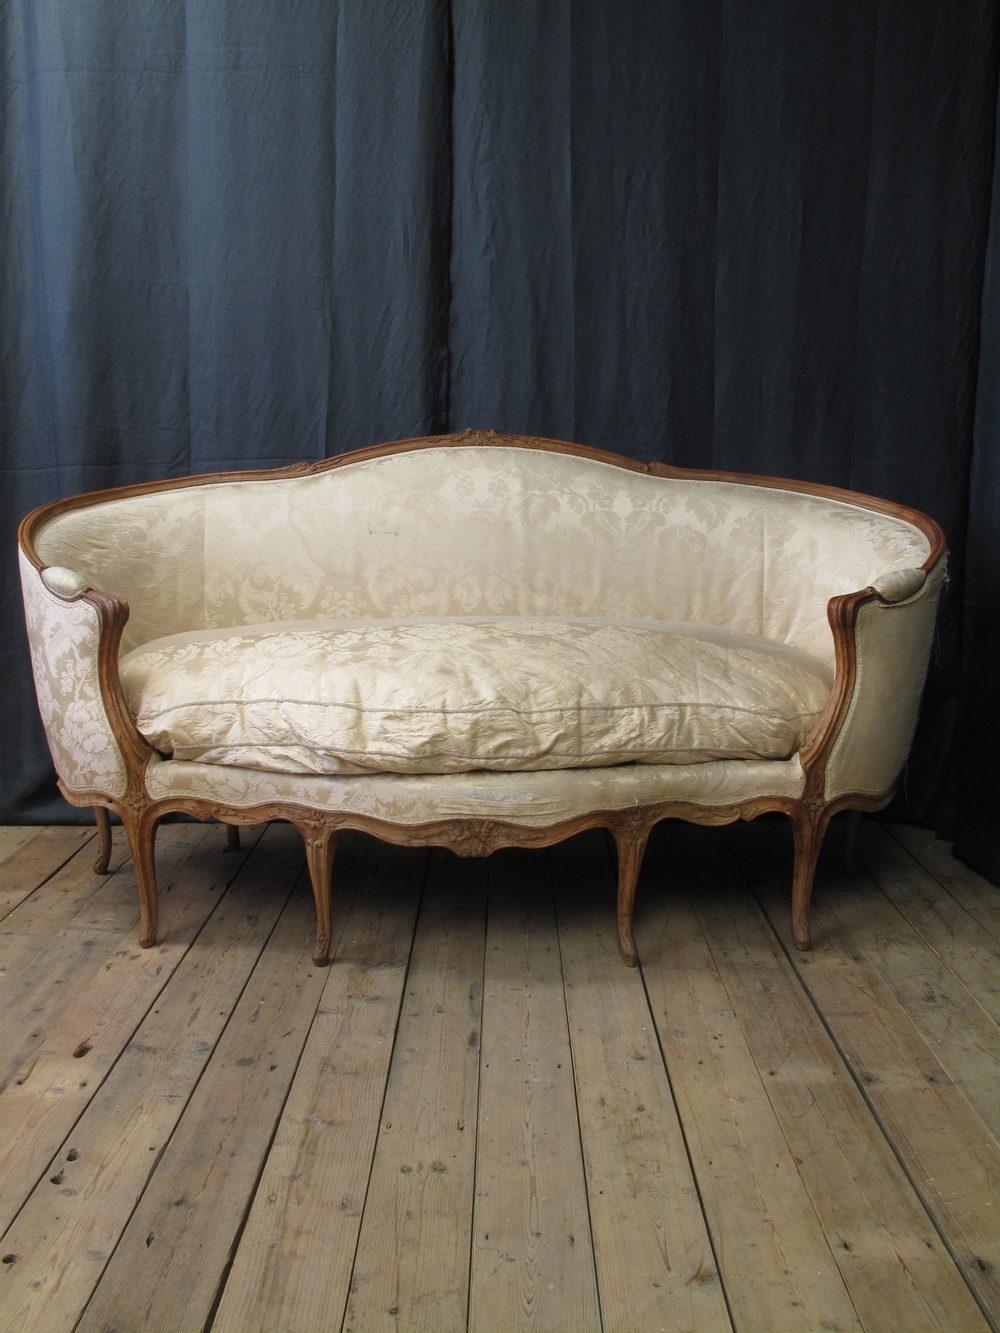 French Louis Xv Canape Corbeille En Hetre Sofa – Antiques Atlas Inside Antique Sofas (View 10 of 10)